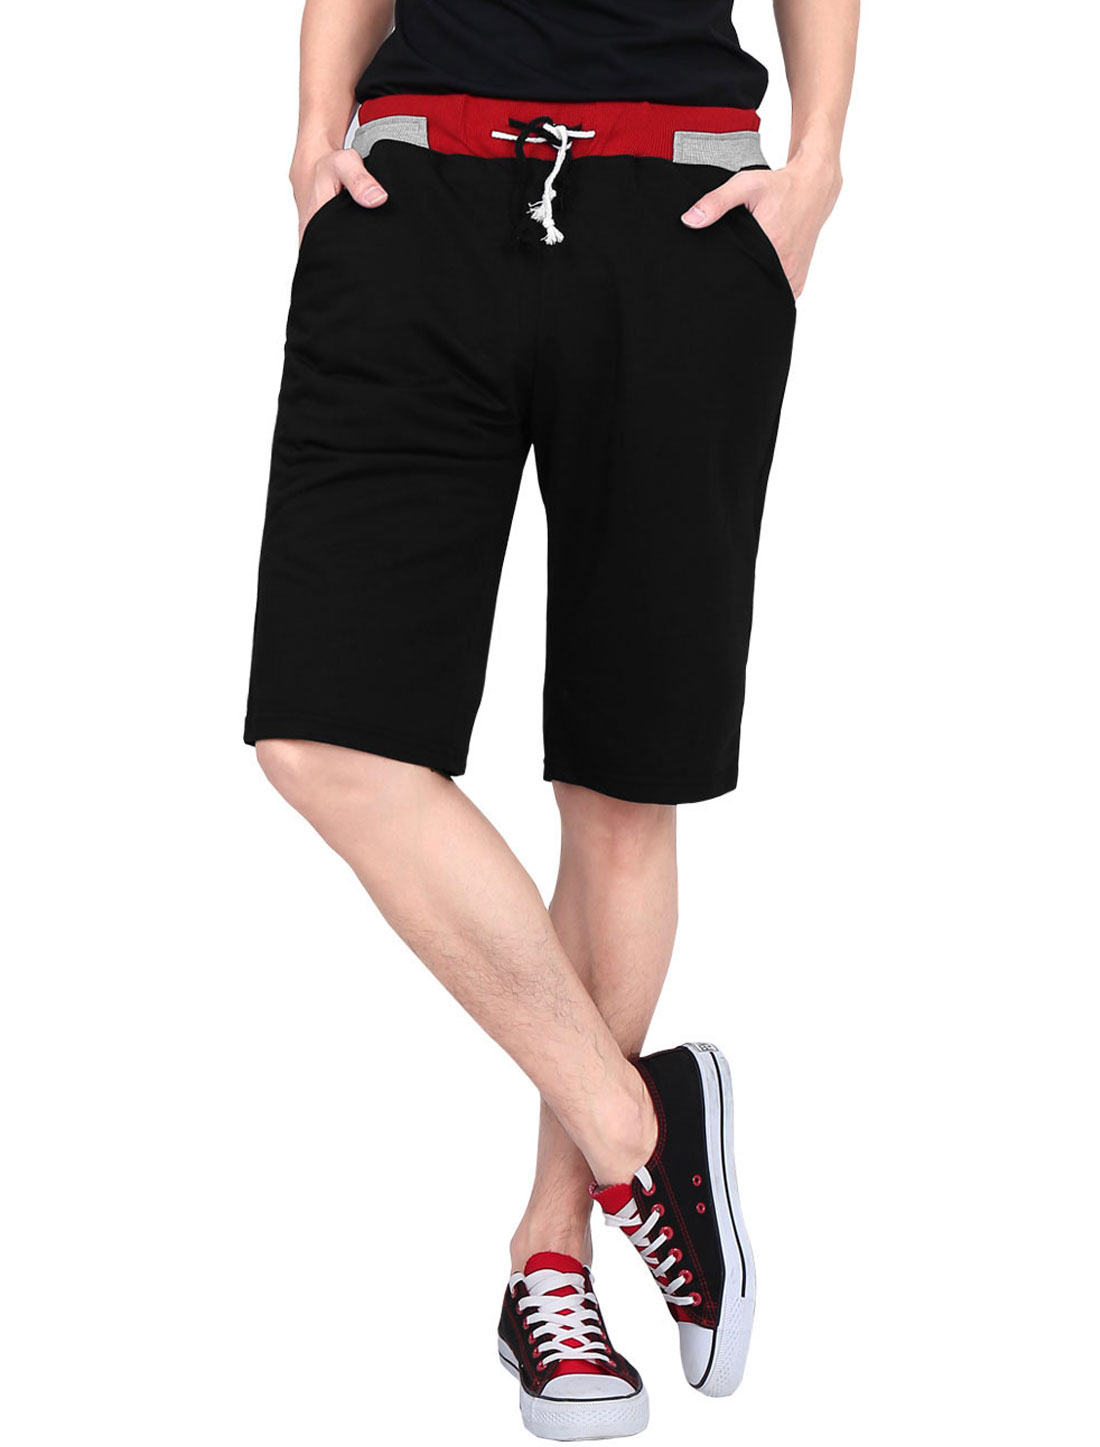 Men Fashion Ribbing Detail Two Pockets Sports Shorts Black W28